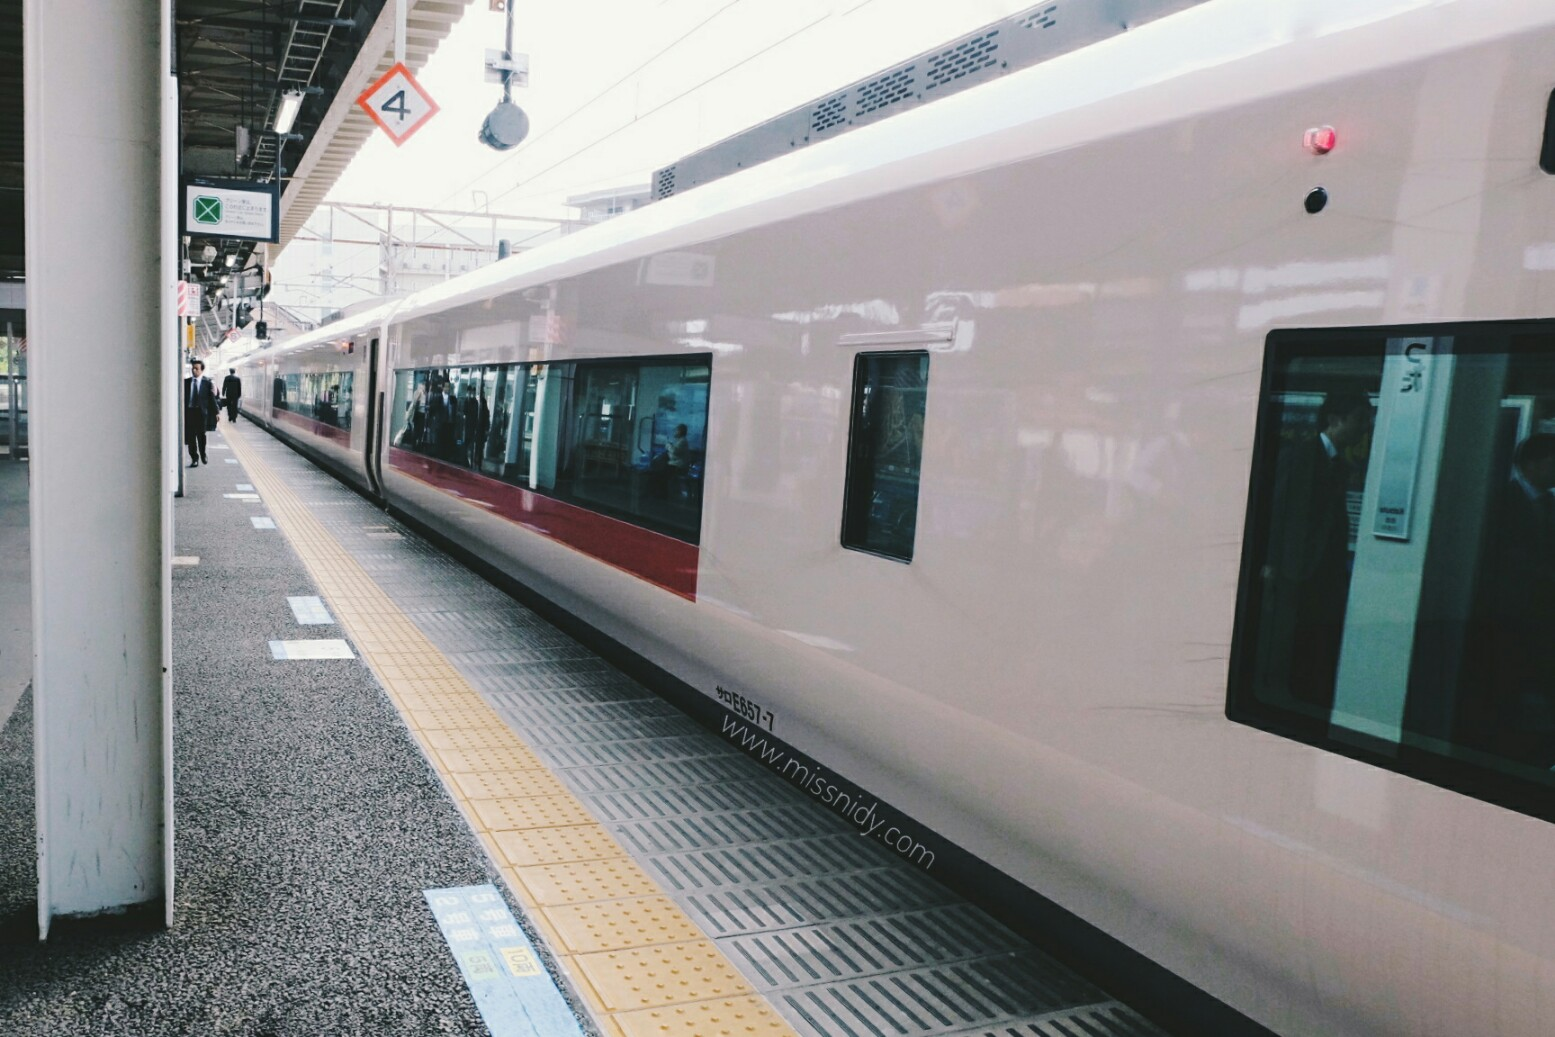 naik shinkansen di jepang